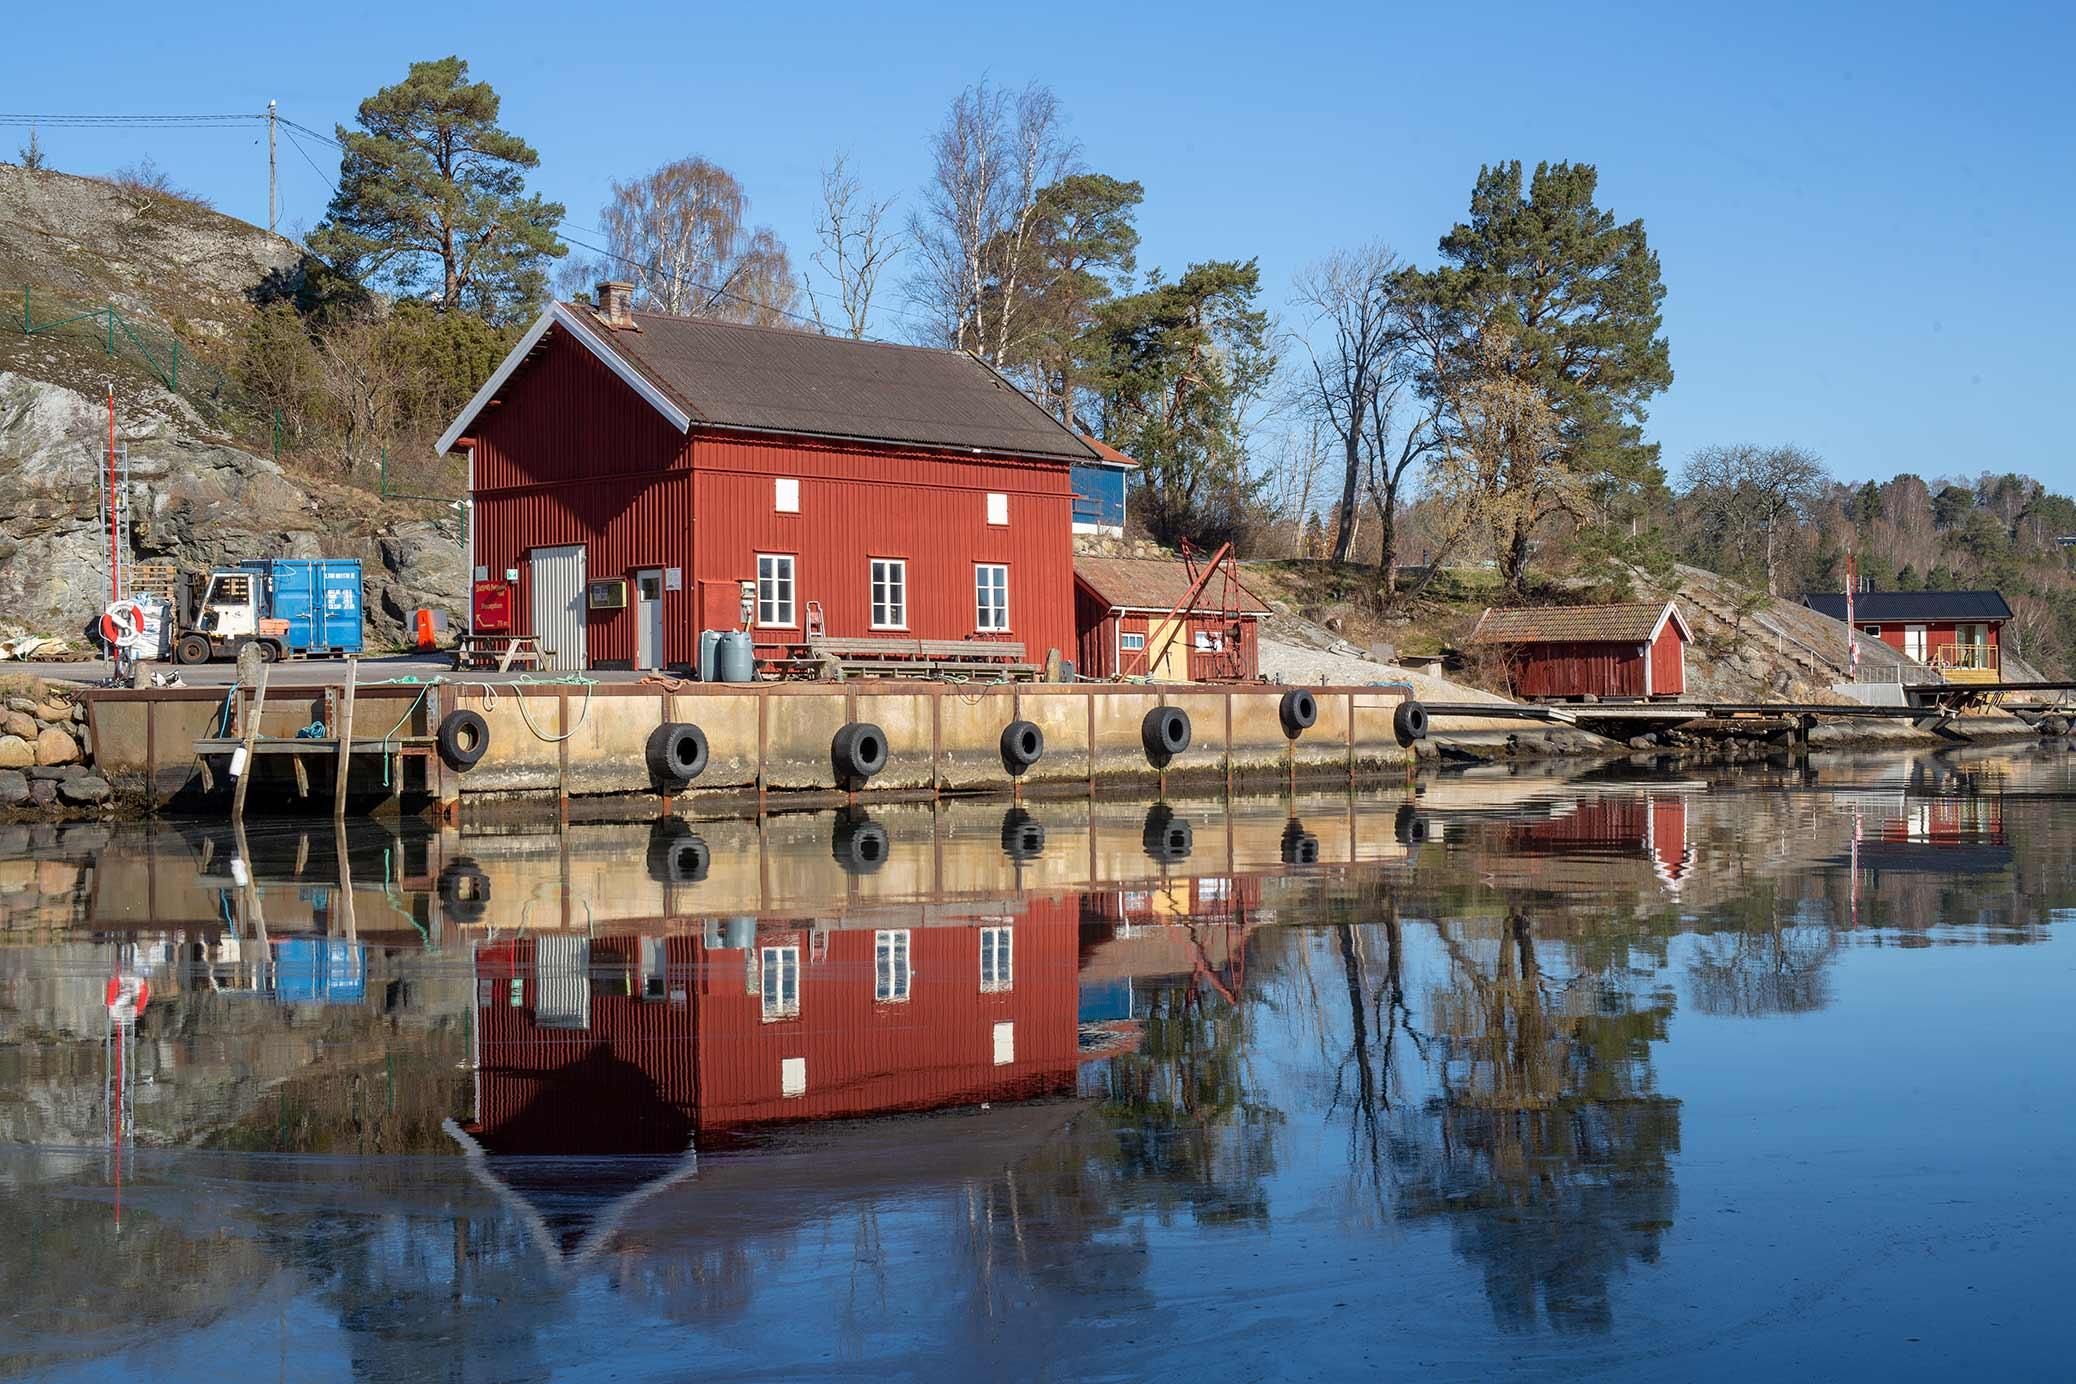 Harbour Store House, Slussen, Orust, Sweden.